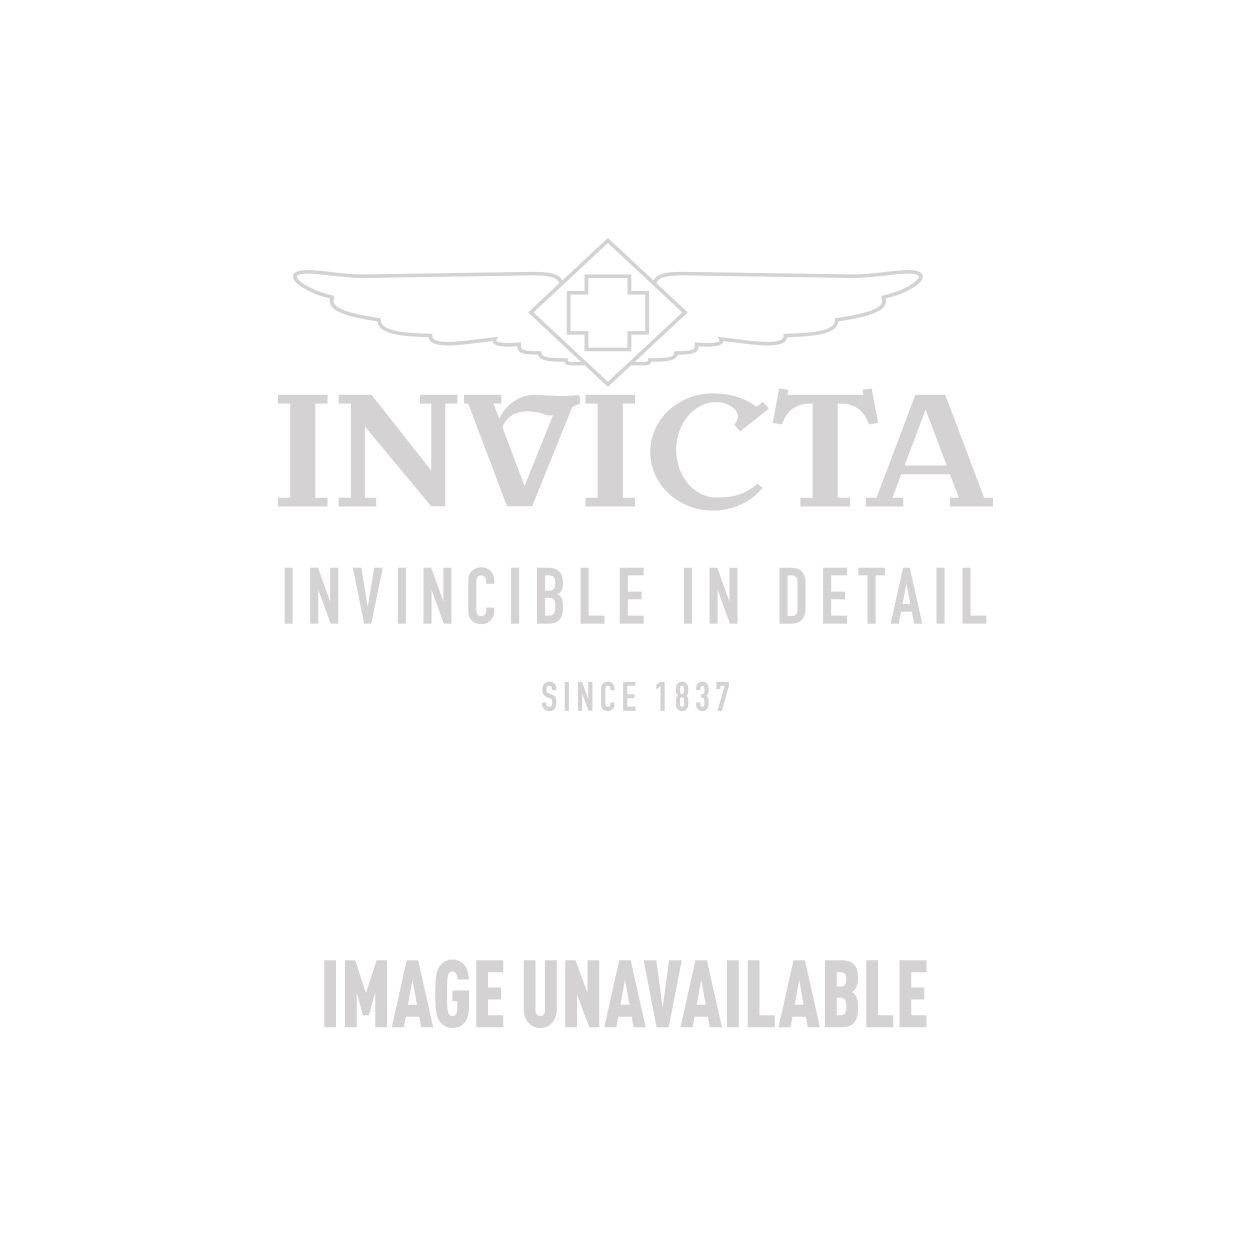 Invicta Russian Diver Quartz Watch - Gold case with Black tone Leather band - Model 14775